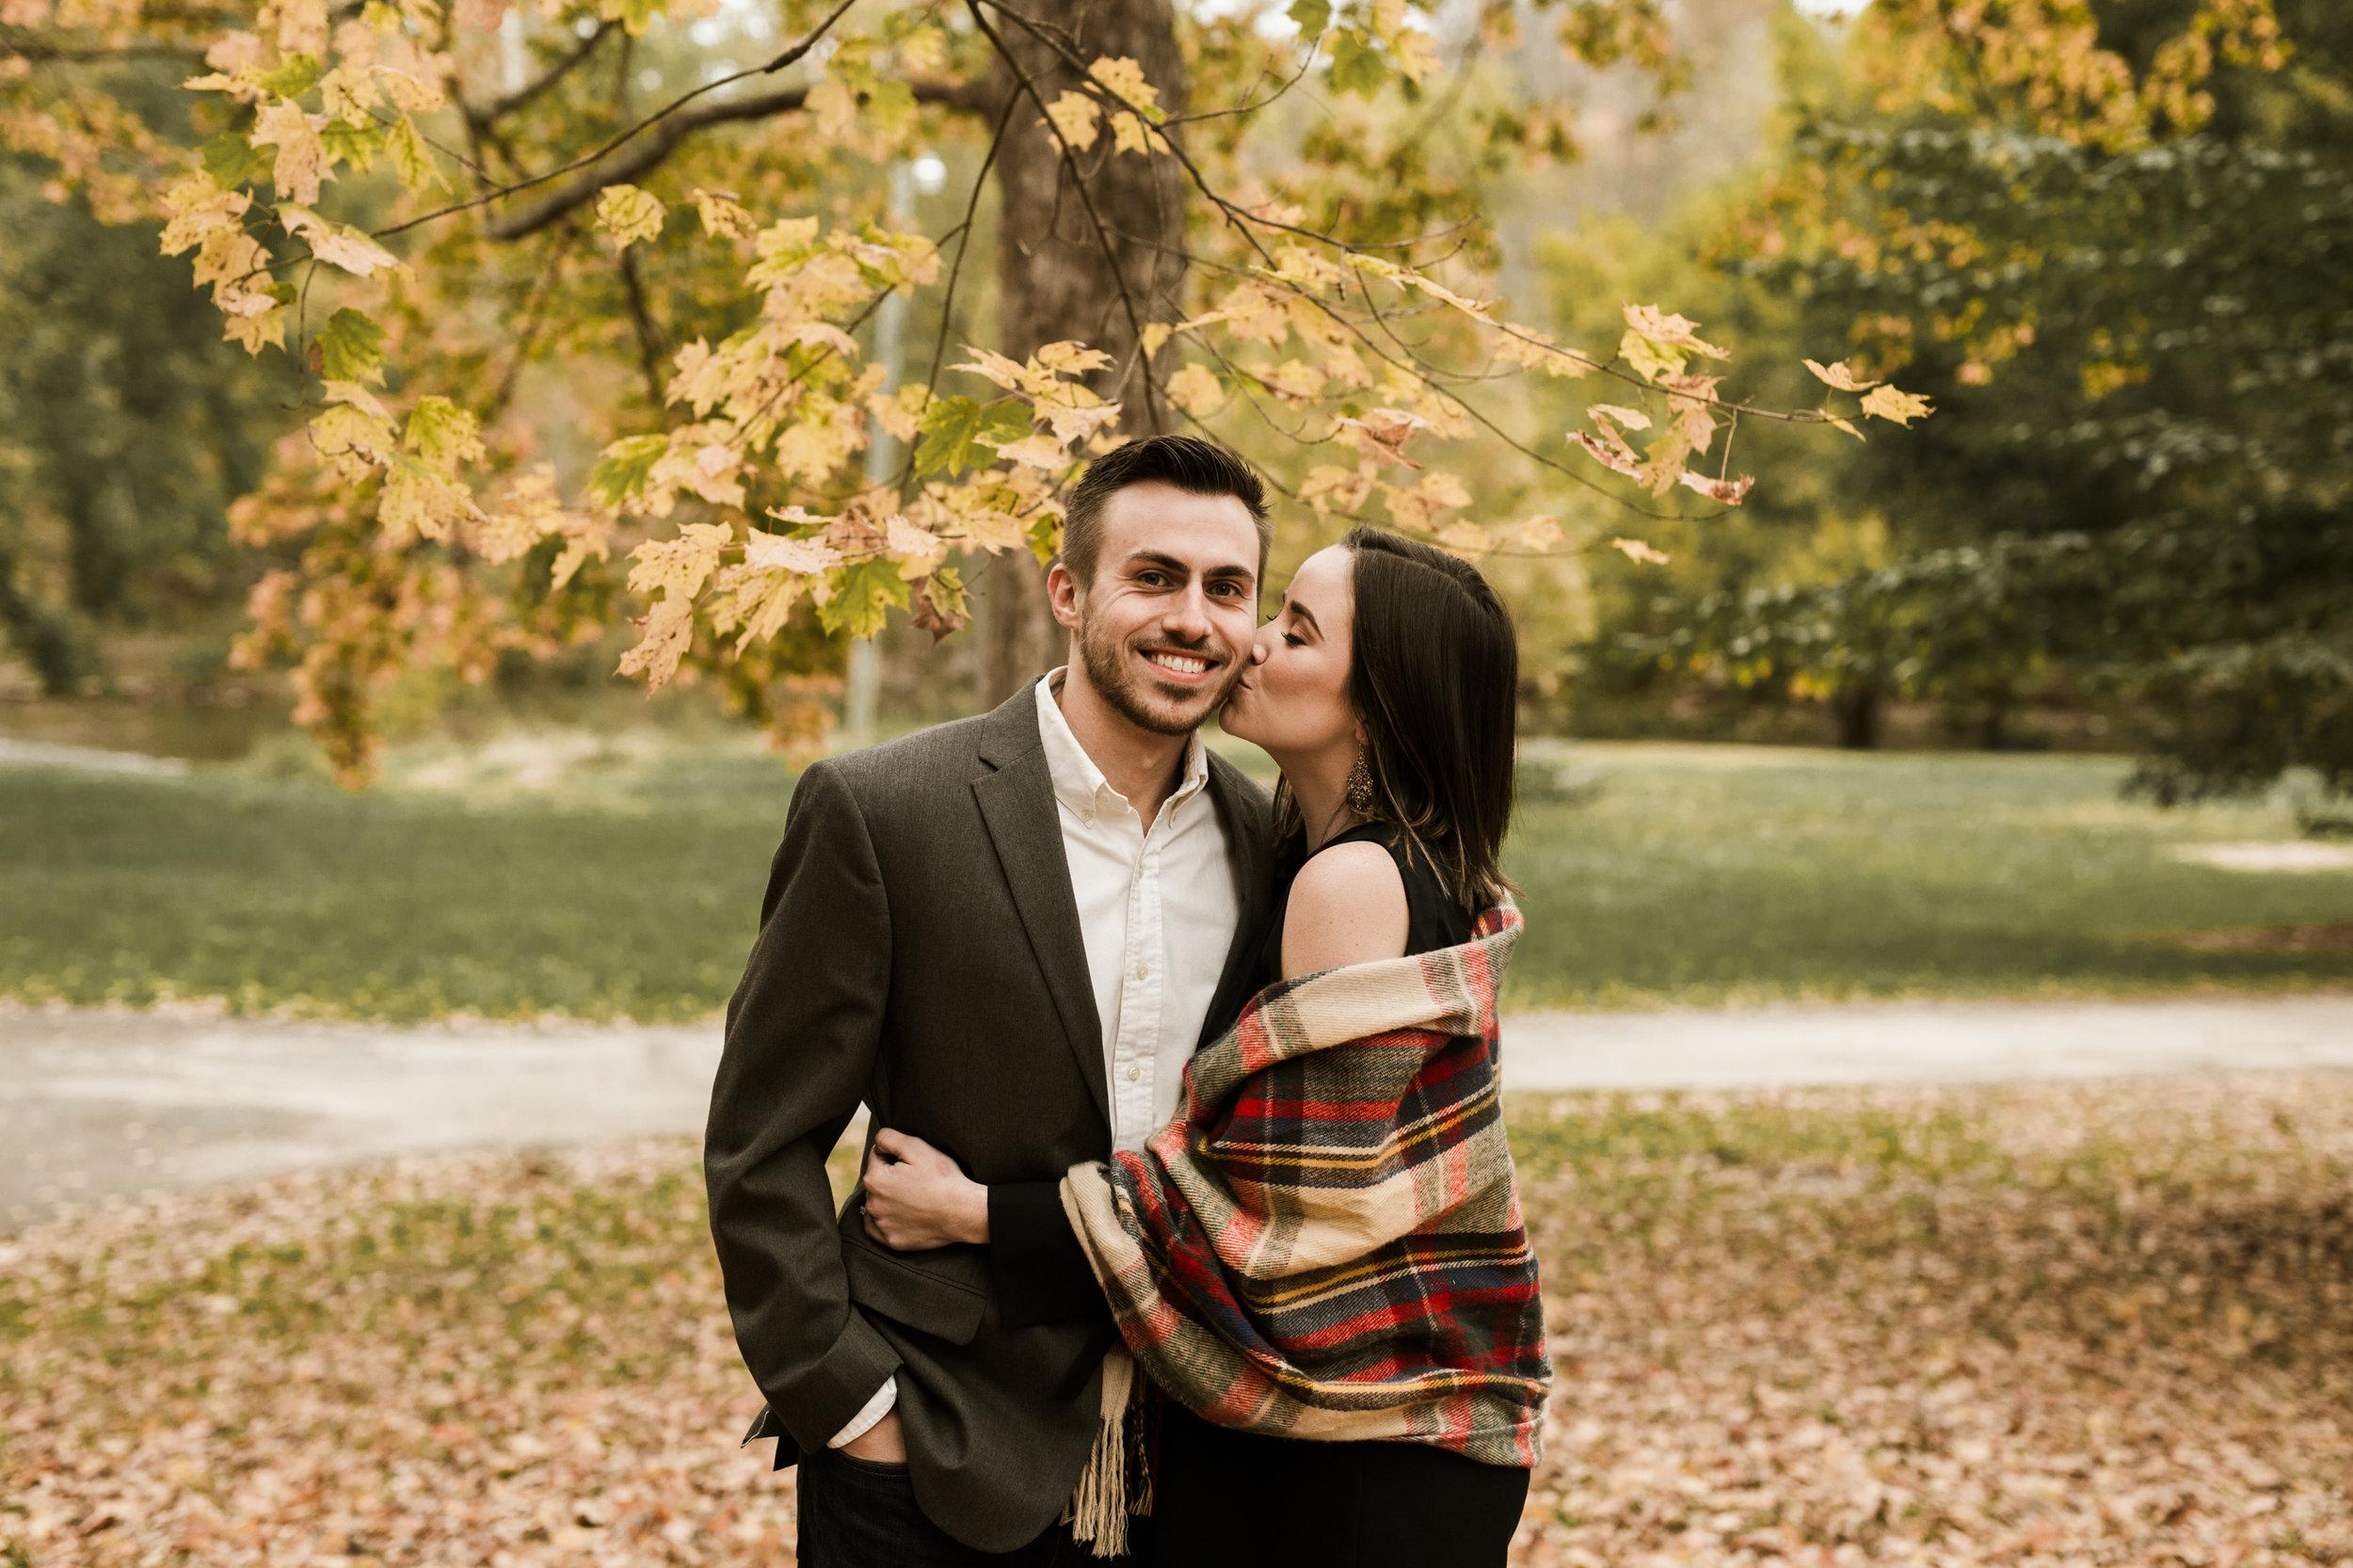 Kelsey and Daniel Engagement 2018 Crystal Ludwick Photo Louisville Wedding Photographer Kentucky Wedding Photographer (29 of 31).jpg